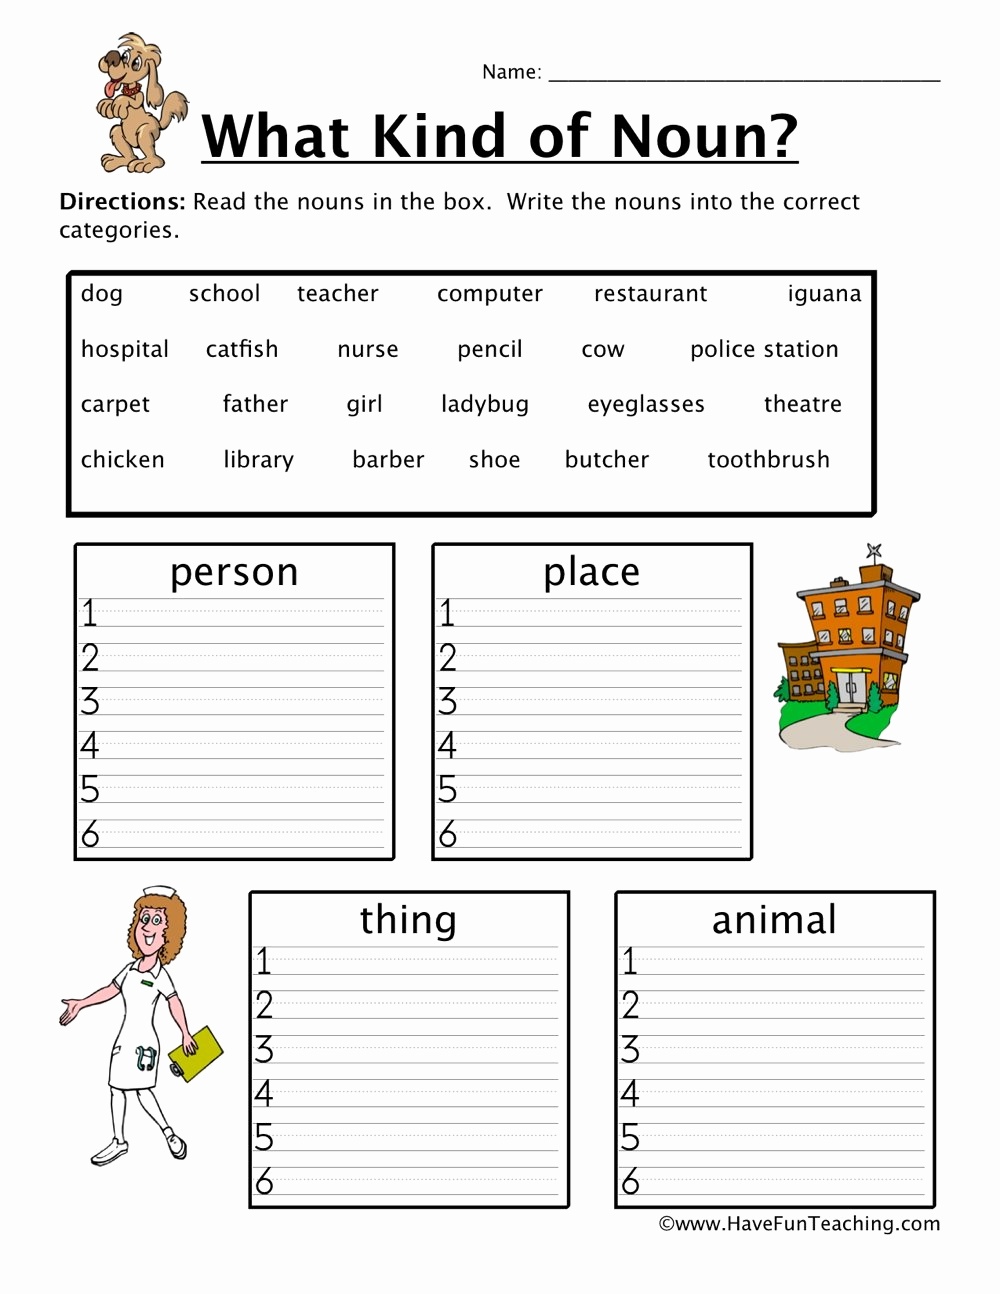 Free Proper Noun Worksheets Inspirational Noun Worksheets